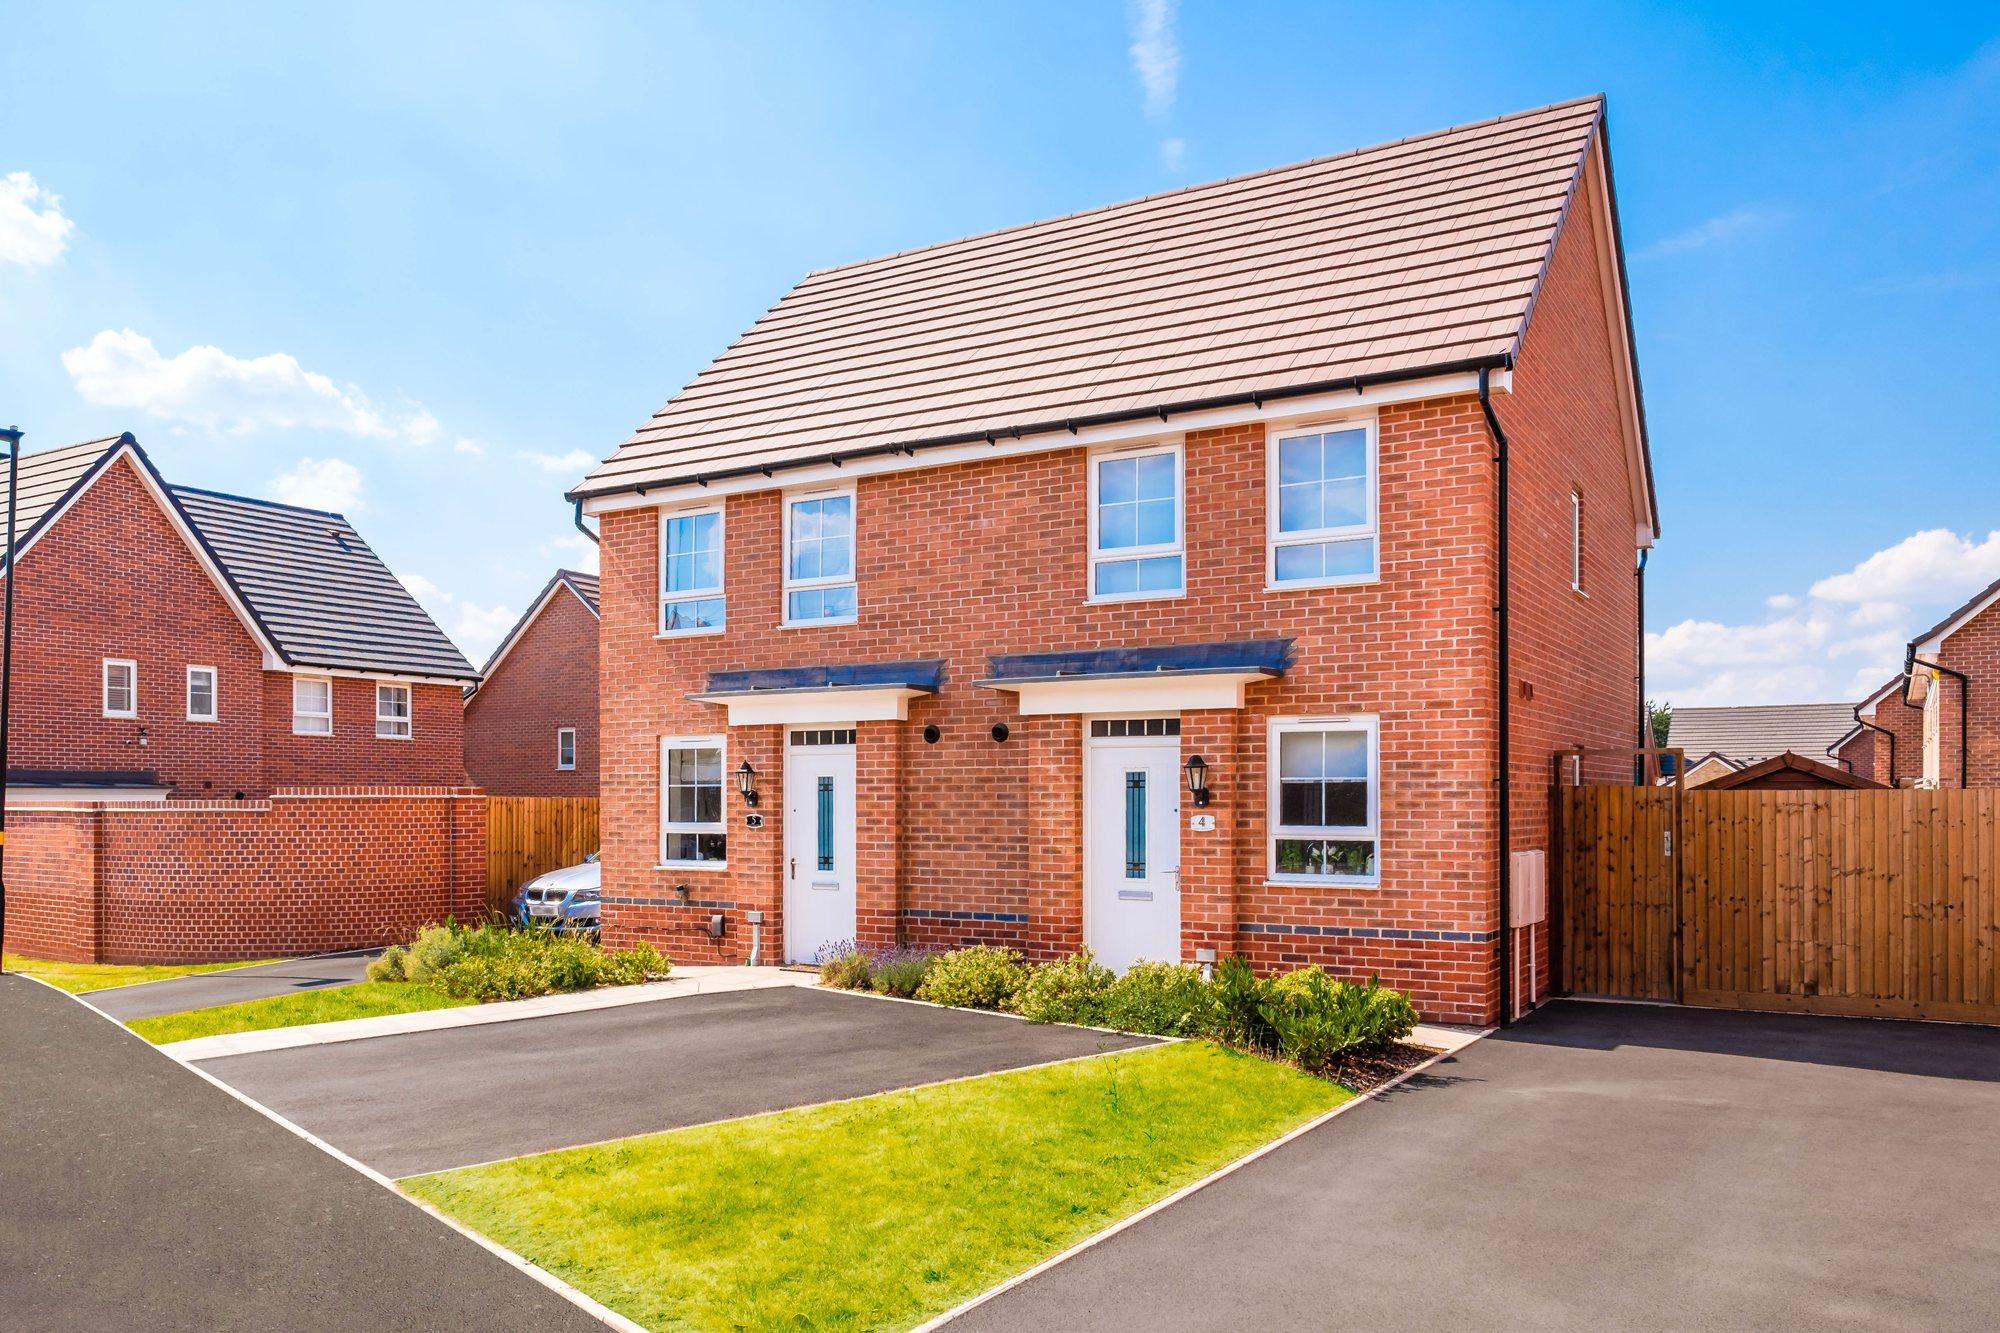 New Build Homes in Wednesbury